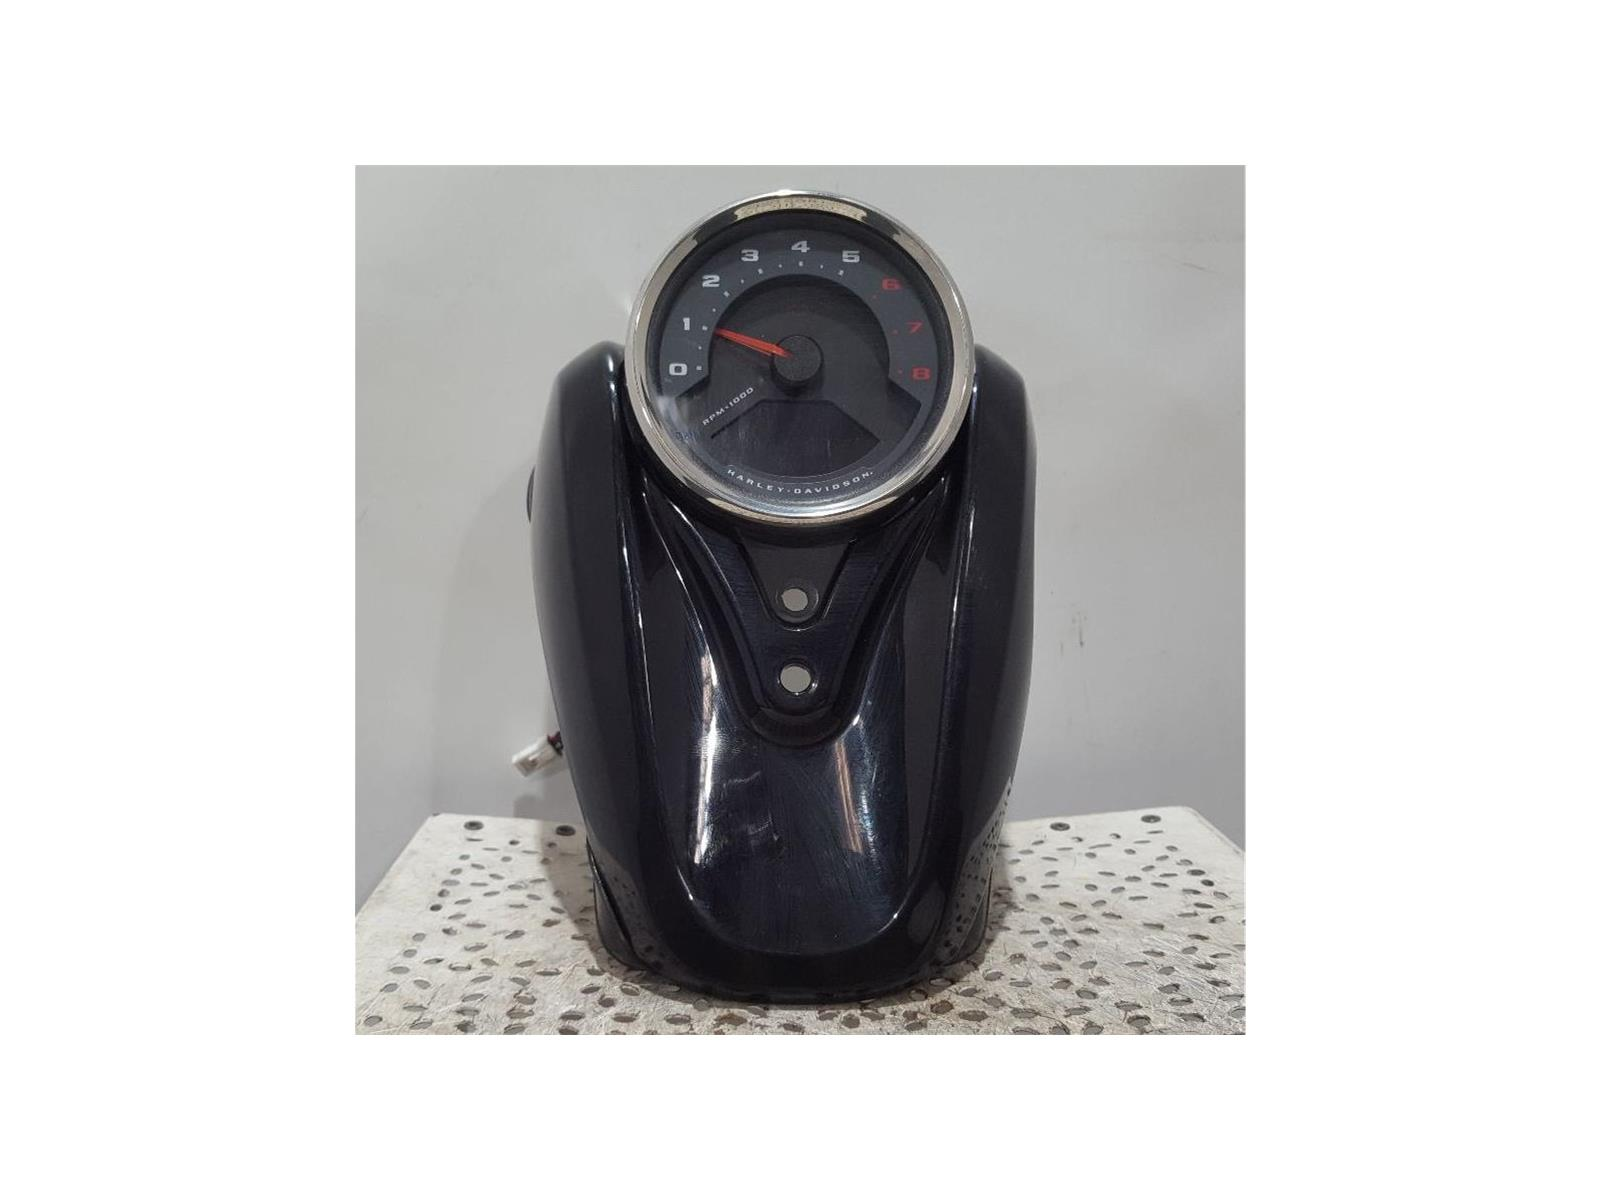 HARLEY DAVIDSON FAT BOB - FXFBS FAT 114 1868 - Instrument Speedo Cluster